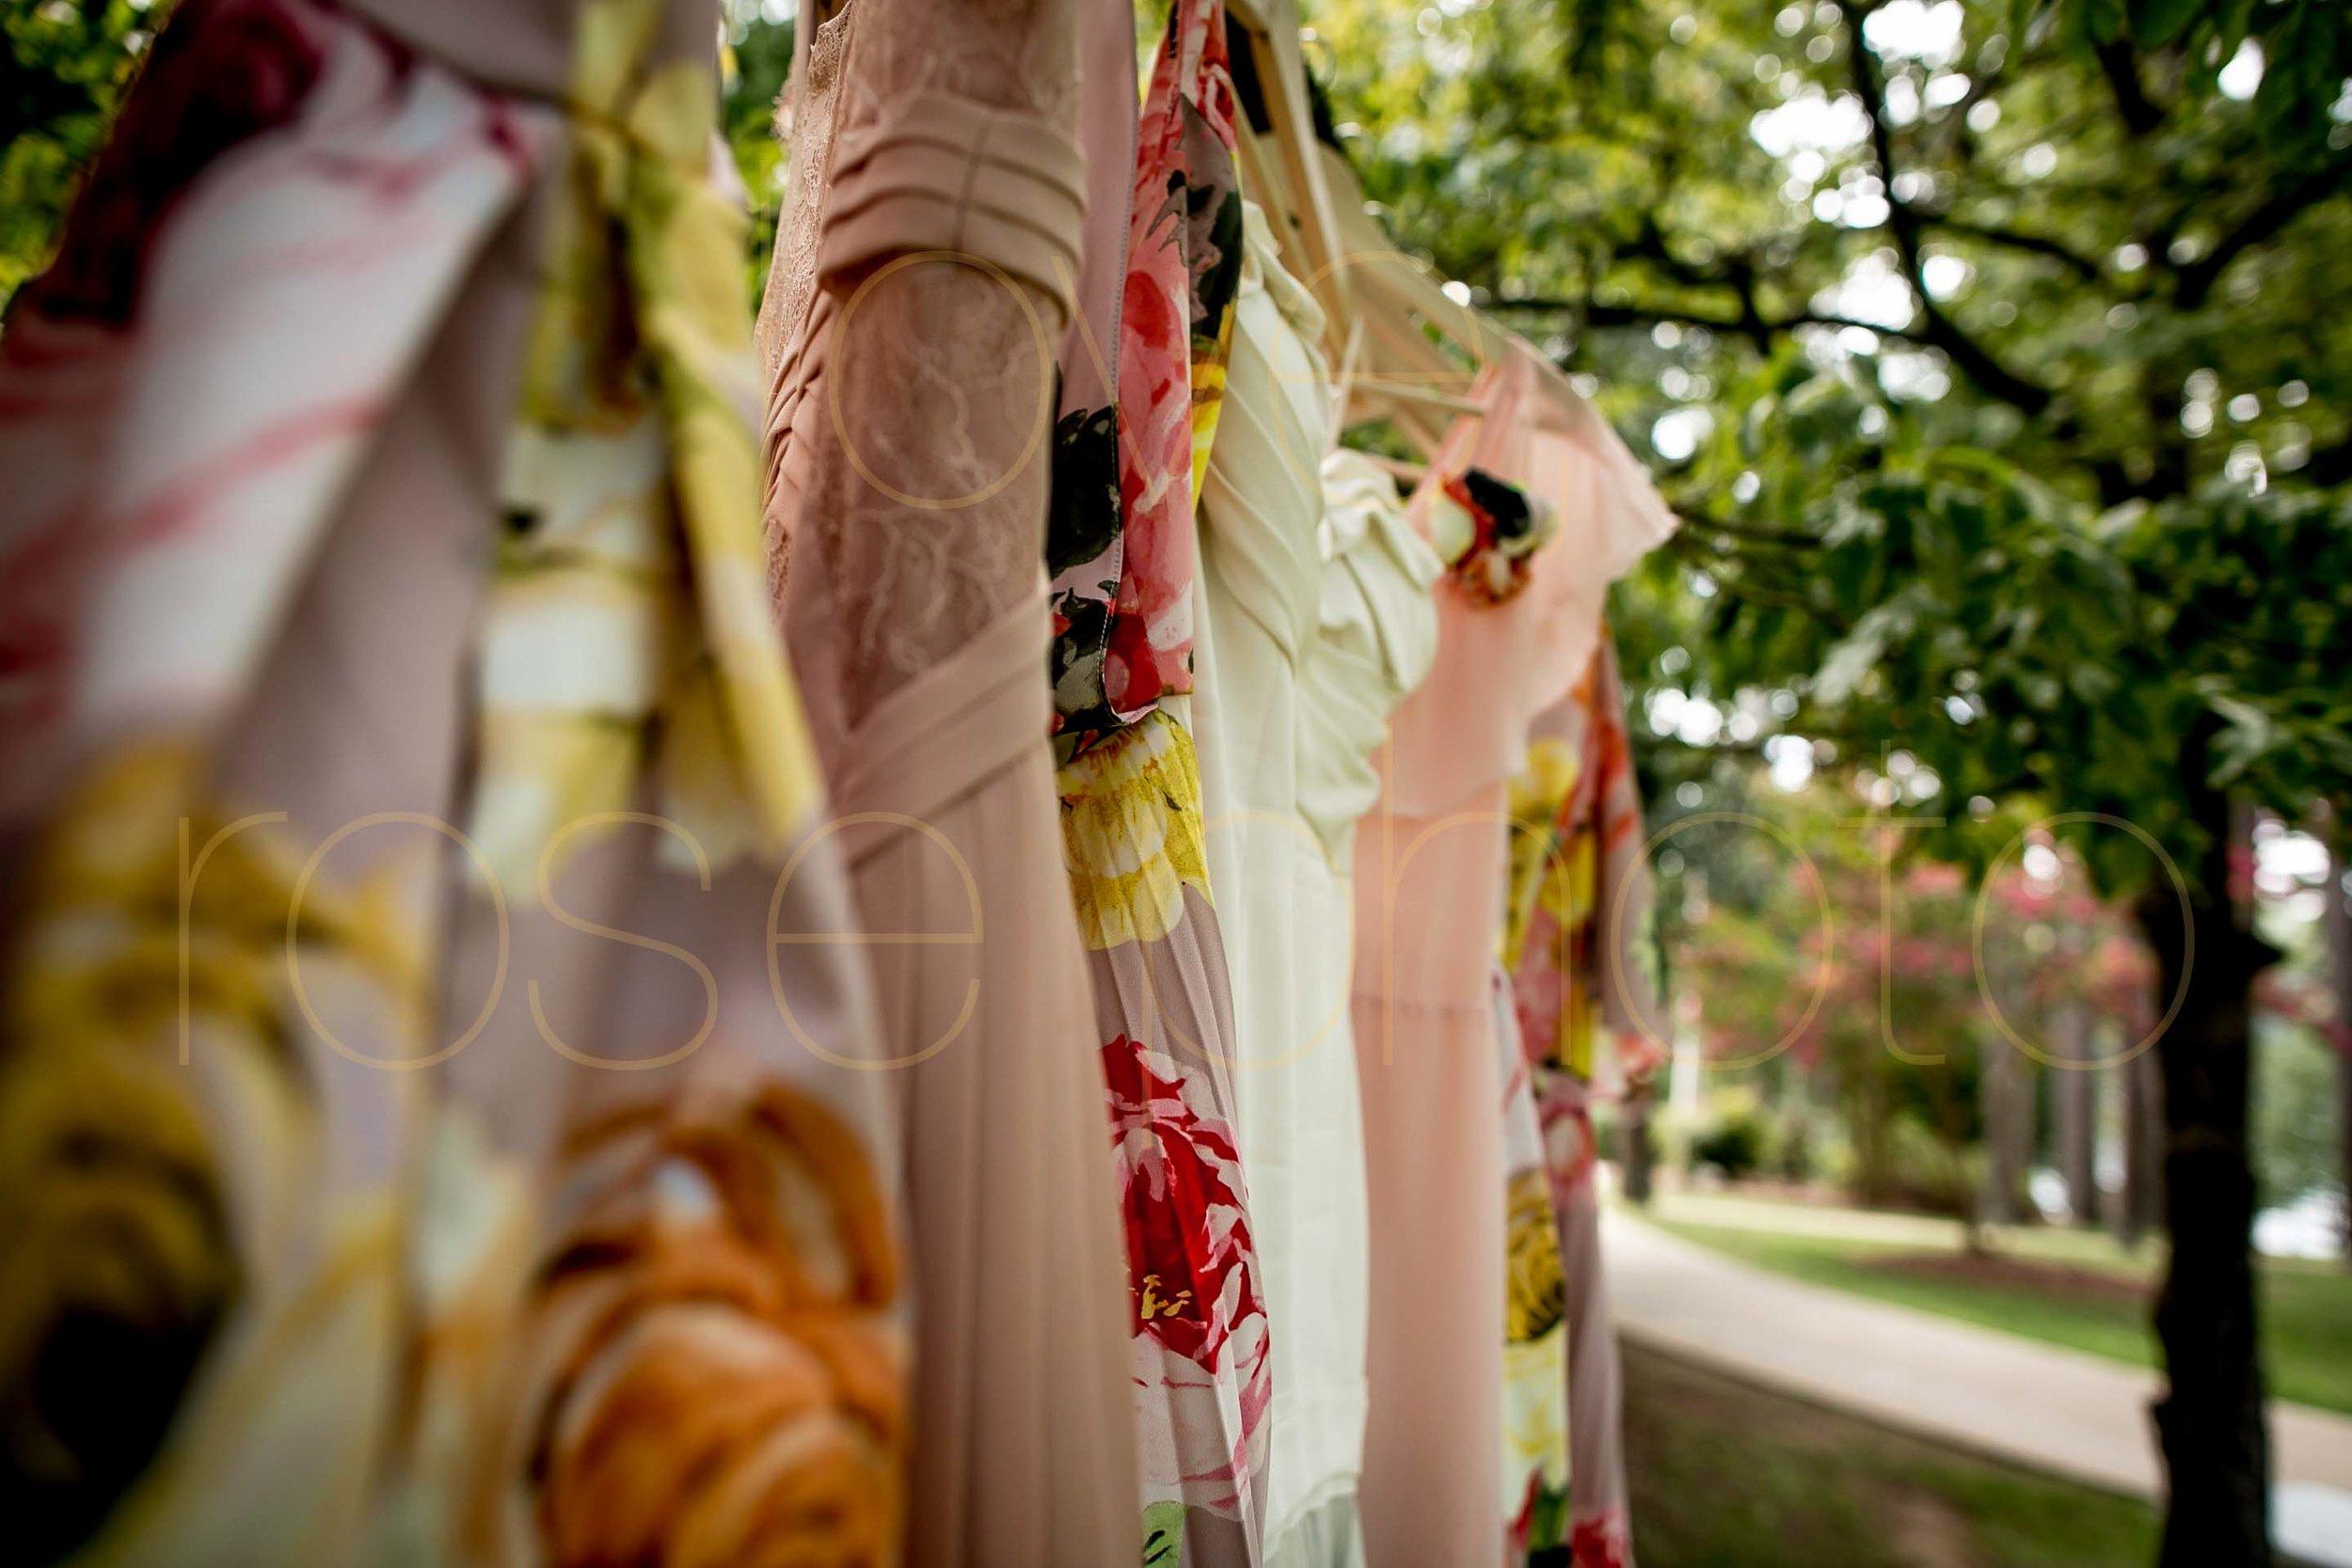 Rose Photo Asheville Wedding Photographer Nasheville Weddings Charleston Bride Chicago photojournalist weddings -60.jpg